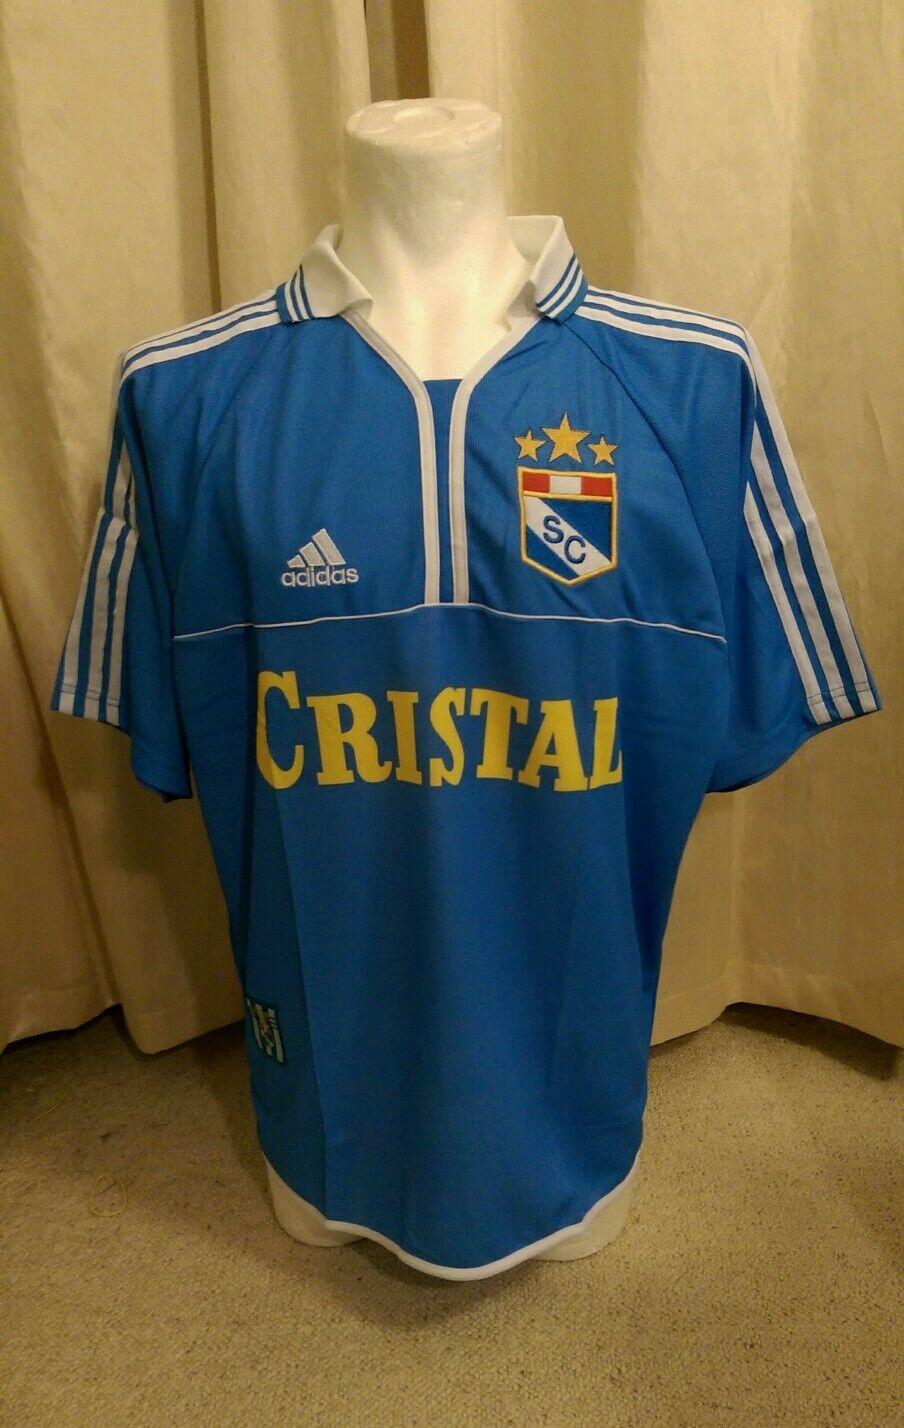 Sporting Cristal 1998 - 2000  Home Shirt By Adidas BNWT (L)  ventas en linea